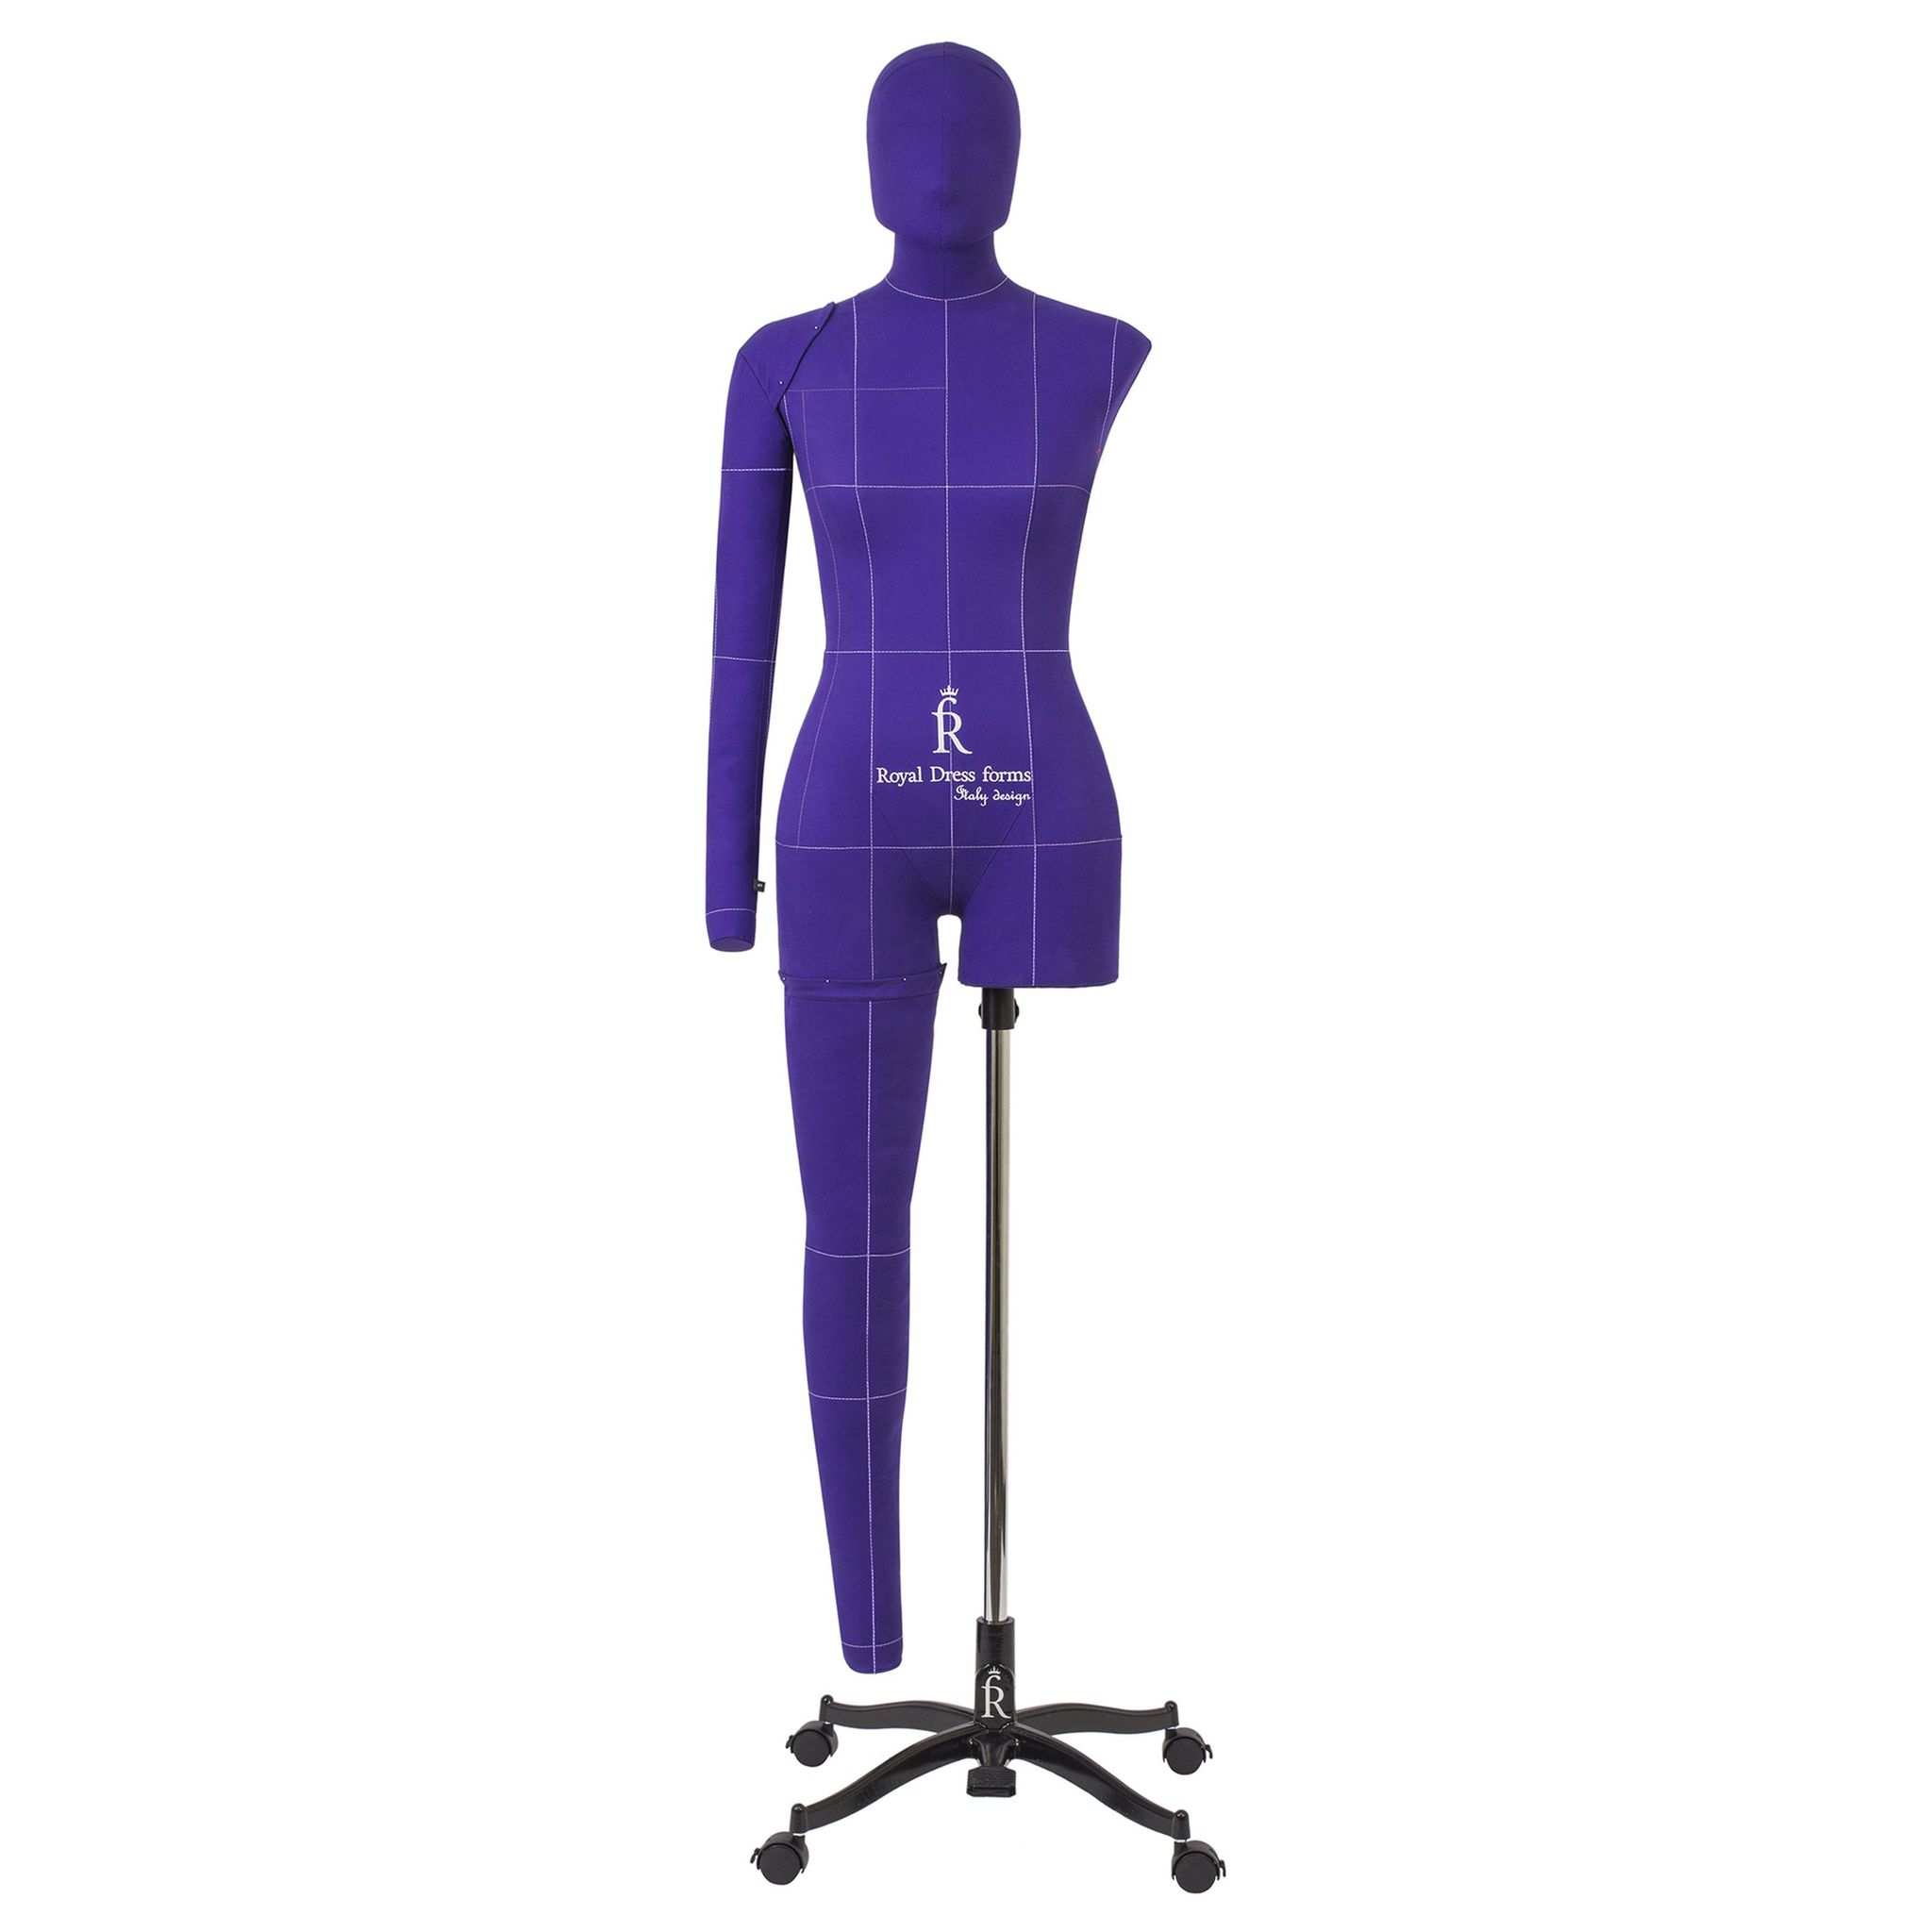 Манекен портновский Моника, комплект Арт, размер 40, ФиолетовыйФото 3